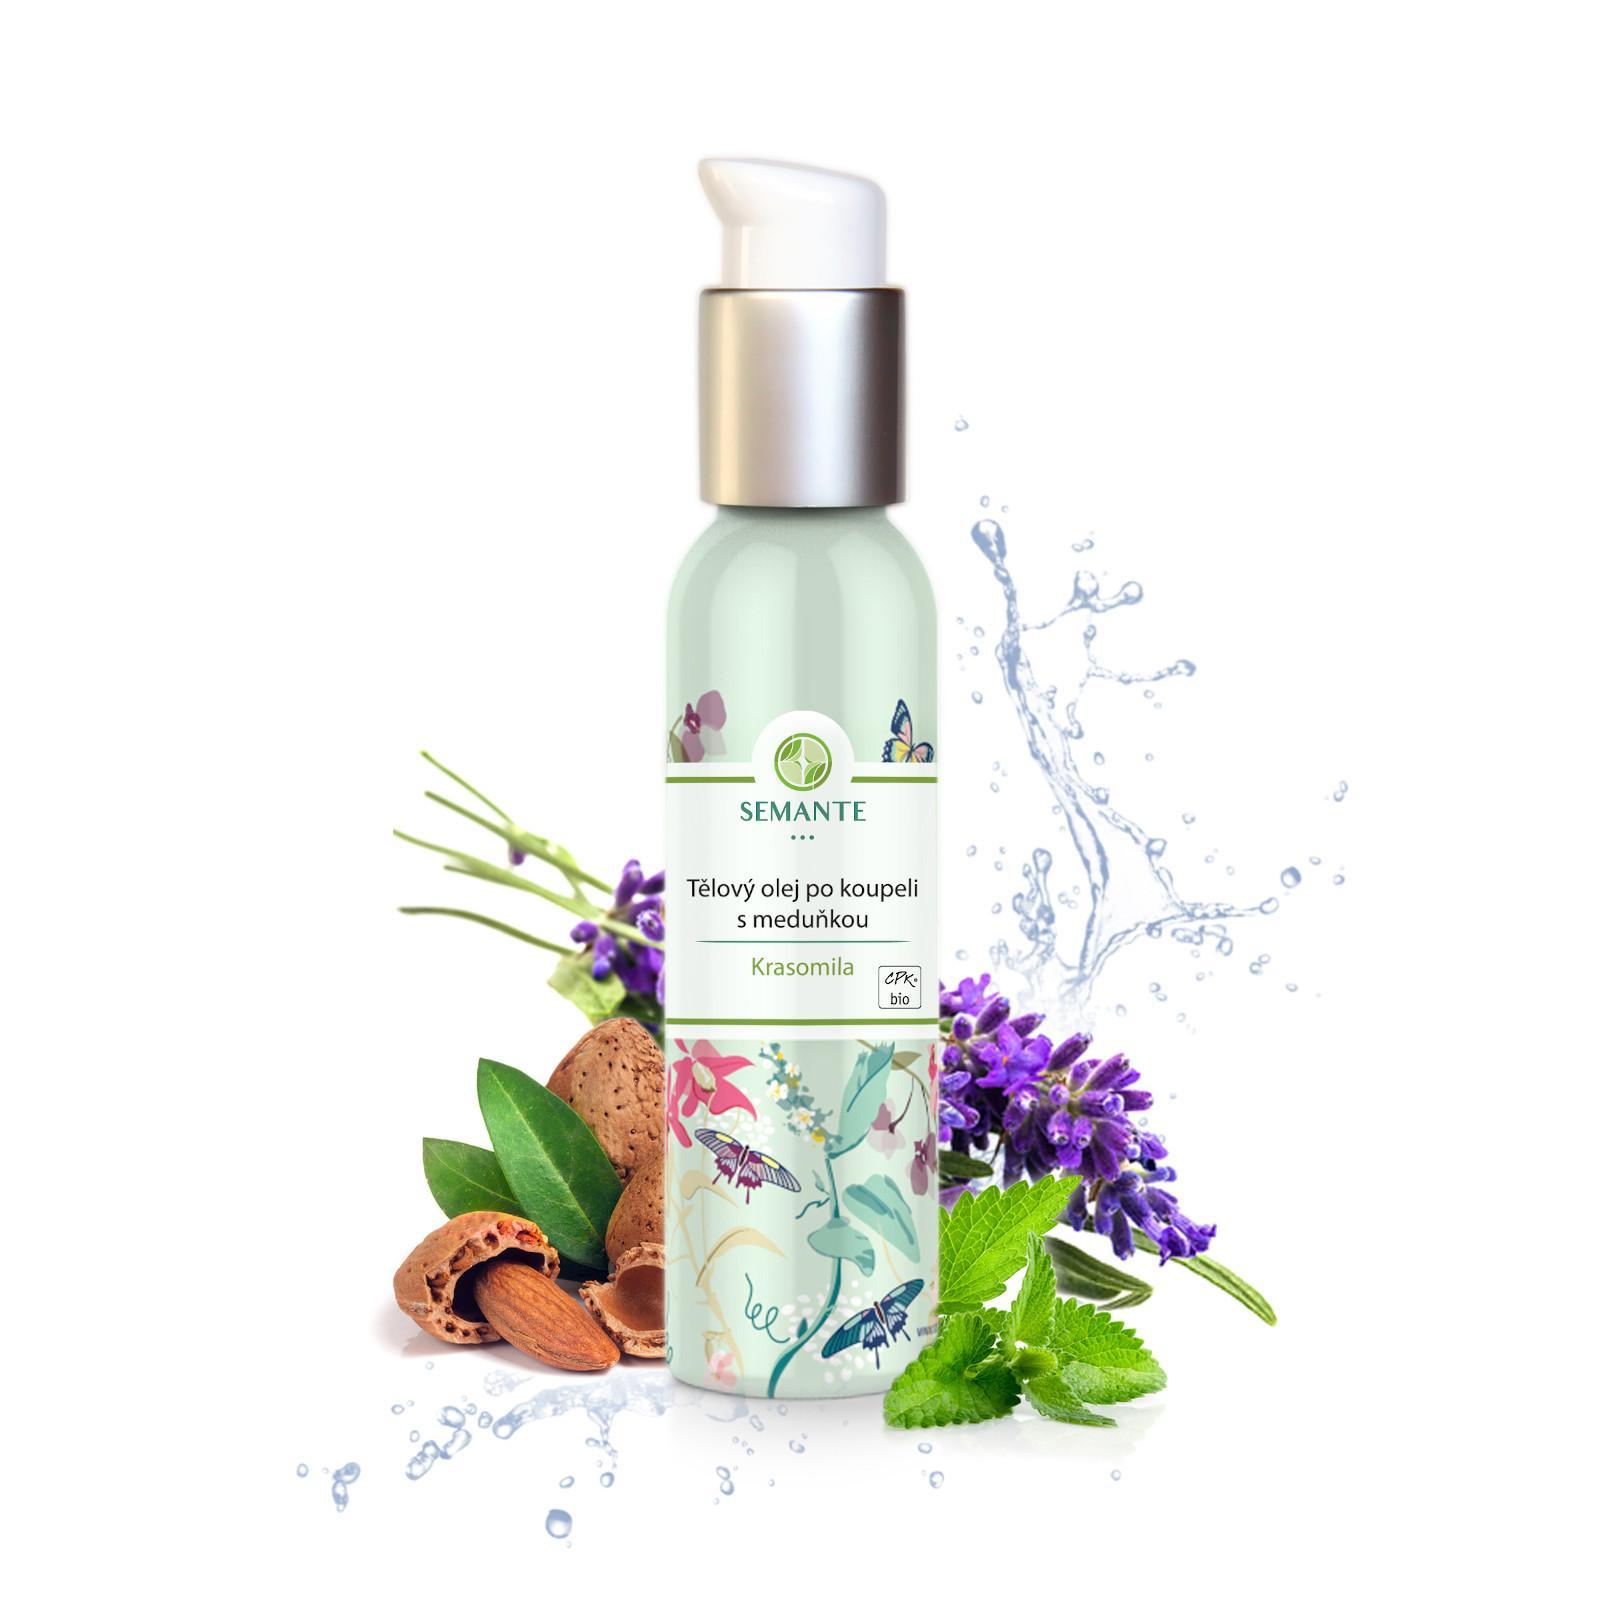 Semante by Naturalis Krasomila, tělový olej po koupeli s meduňkou 100 ml